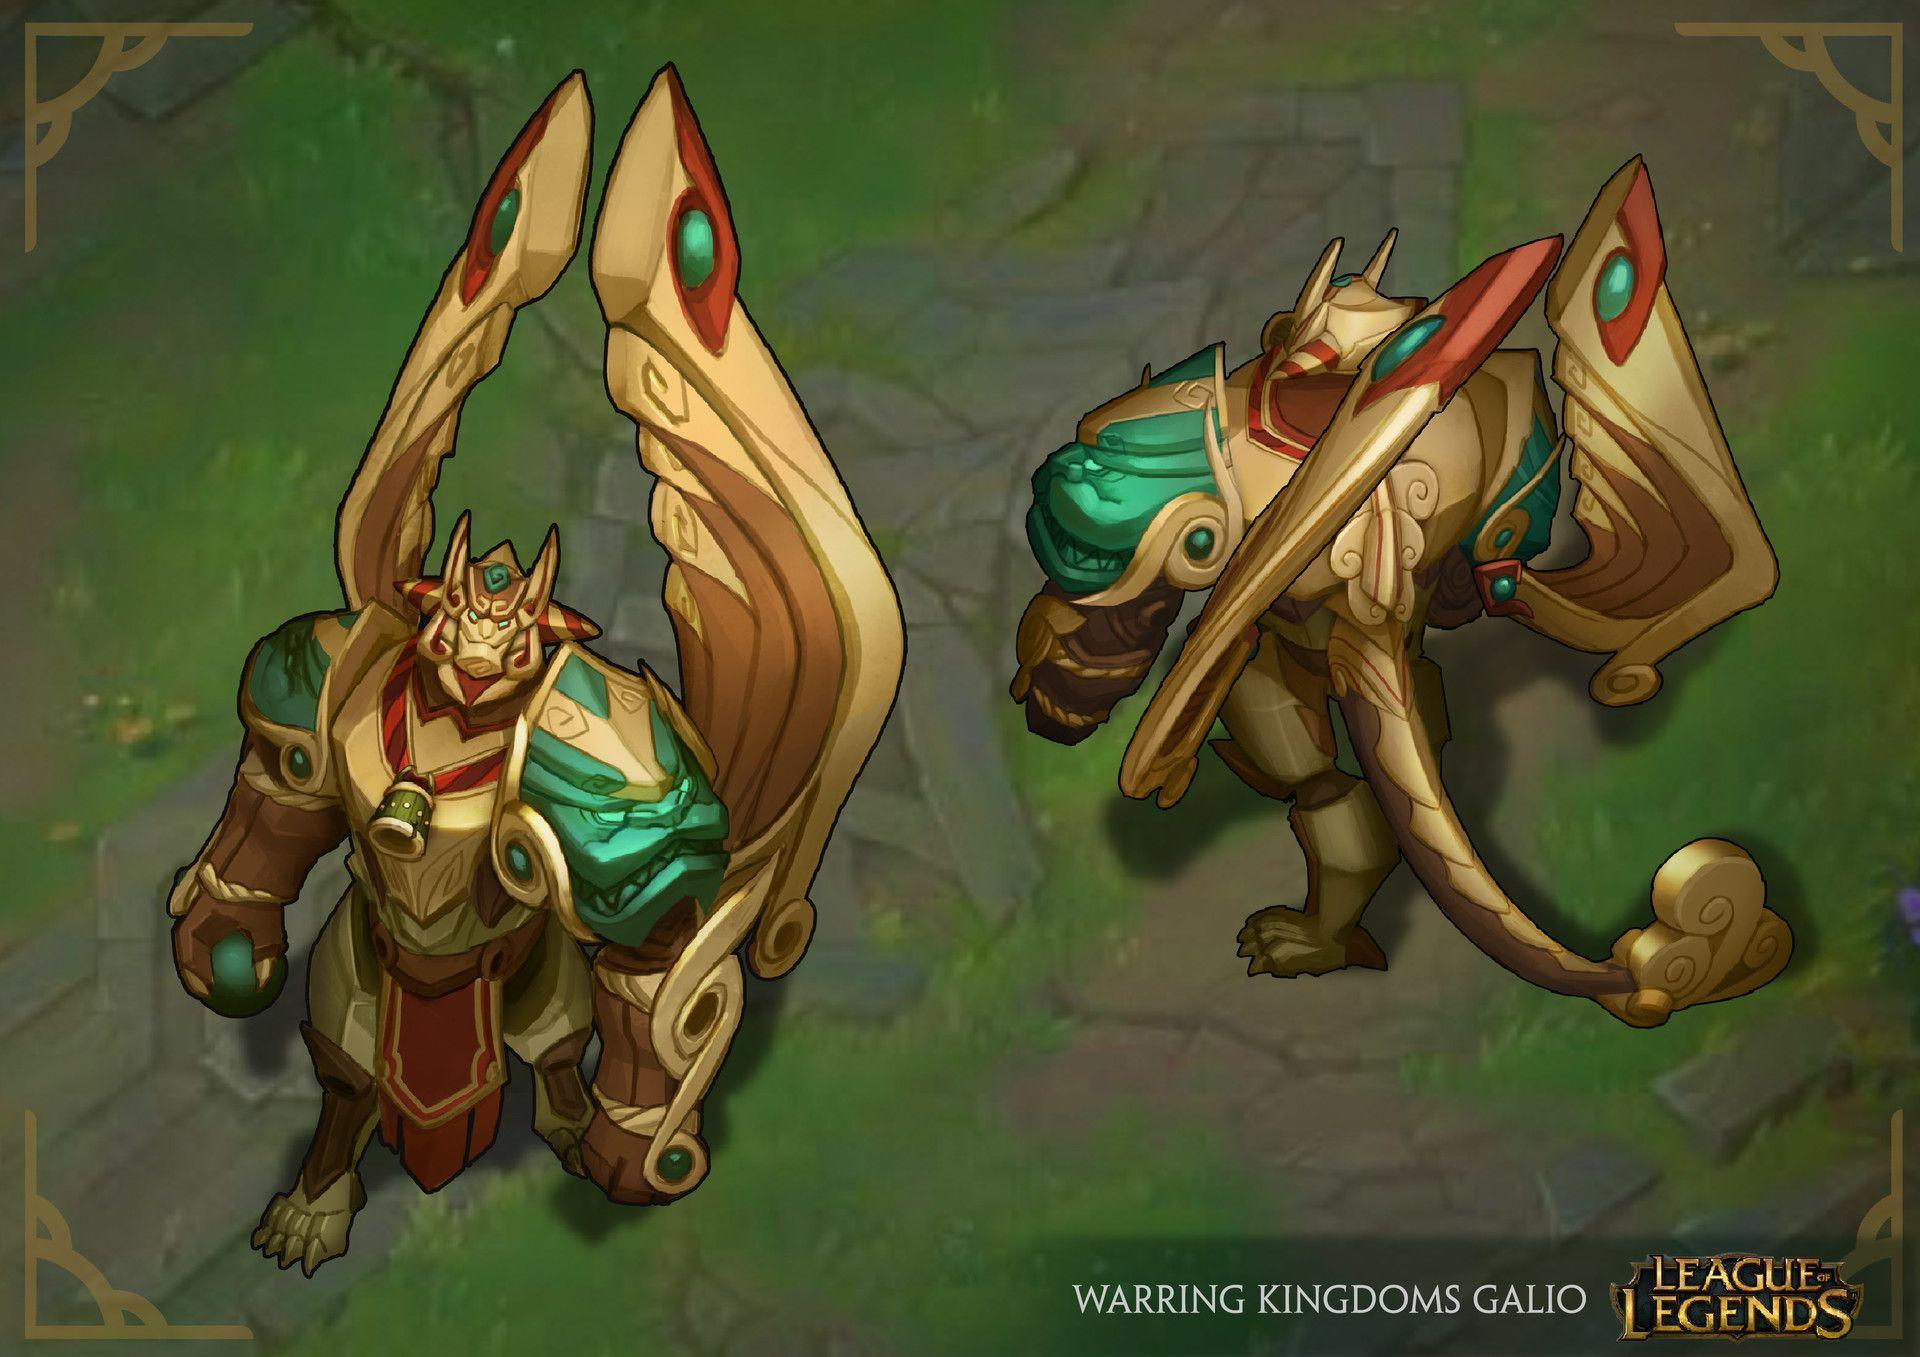 Warring Kingdoms Galio League Of Legends Skin Concept By Nicholas Oei Lol League Of Legends Champions League Of Legends League Of Legends Characters